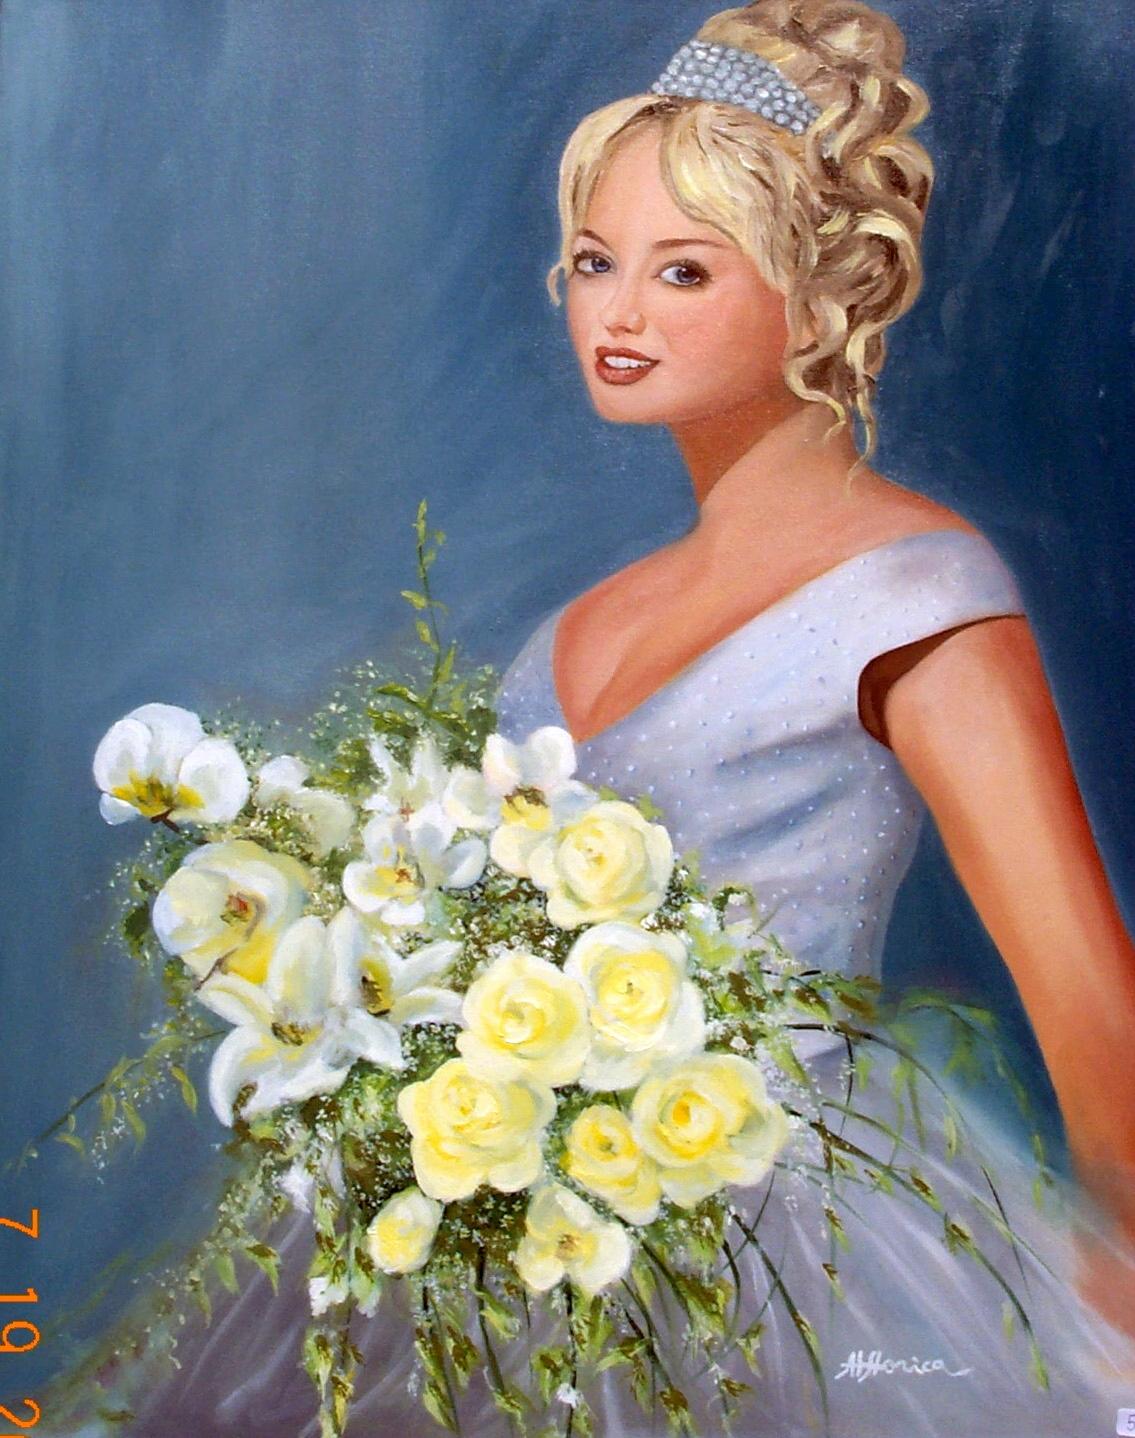 32_The_bride_24x30_200